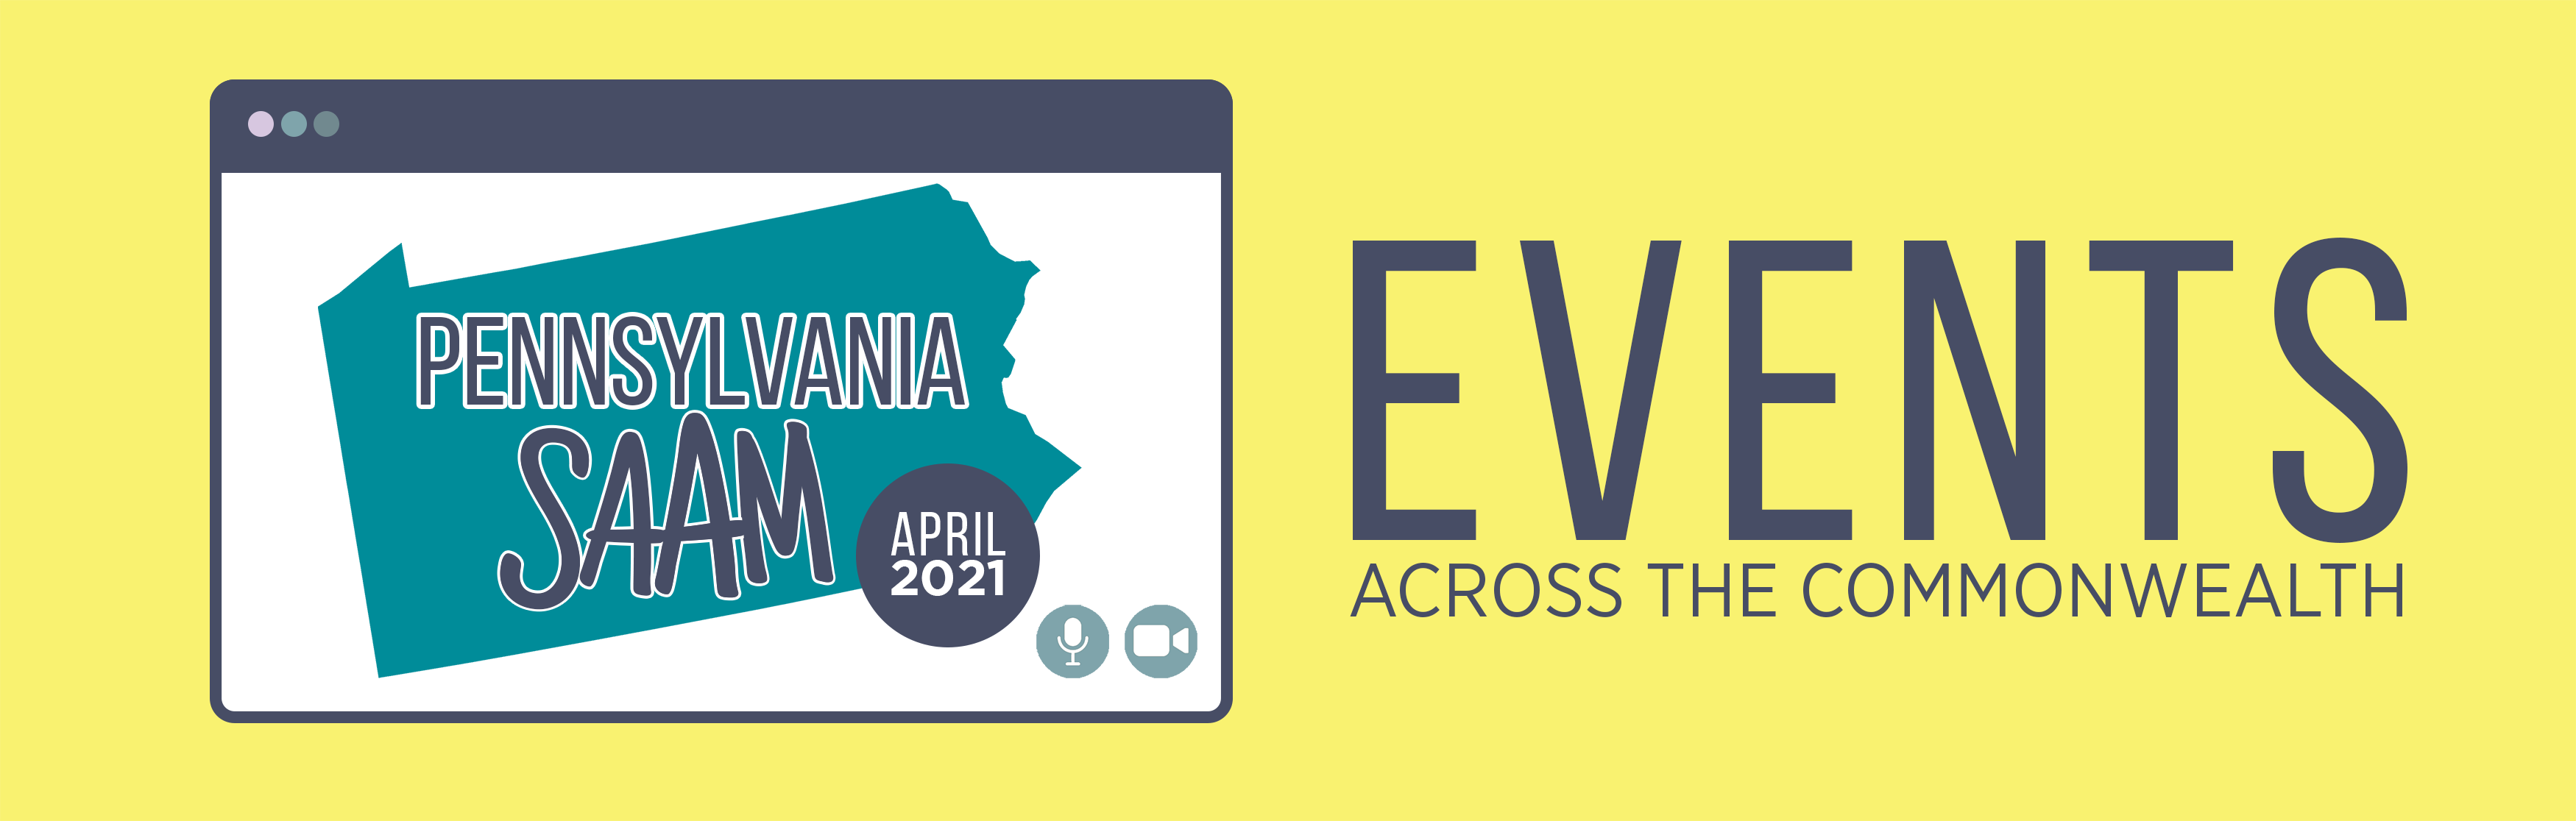 Pennsylvania SAAM April 2021: Events Across the Commonwealth